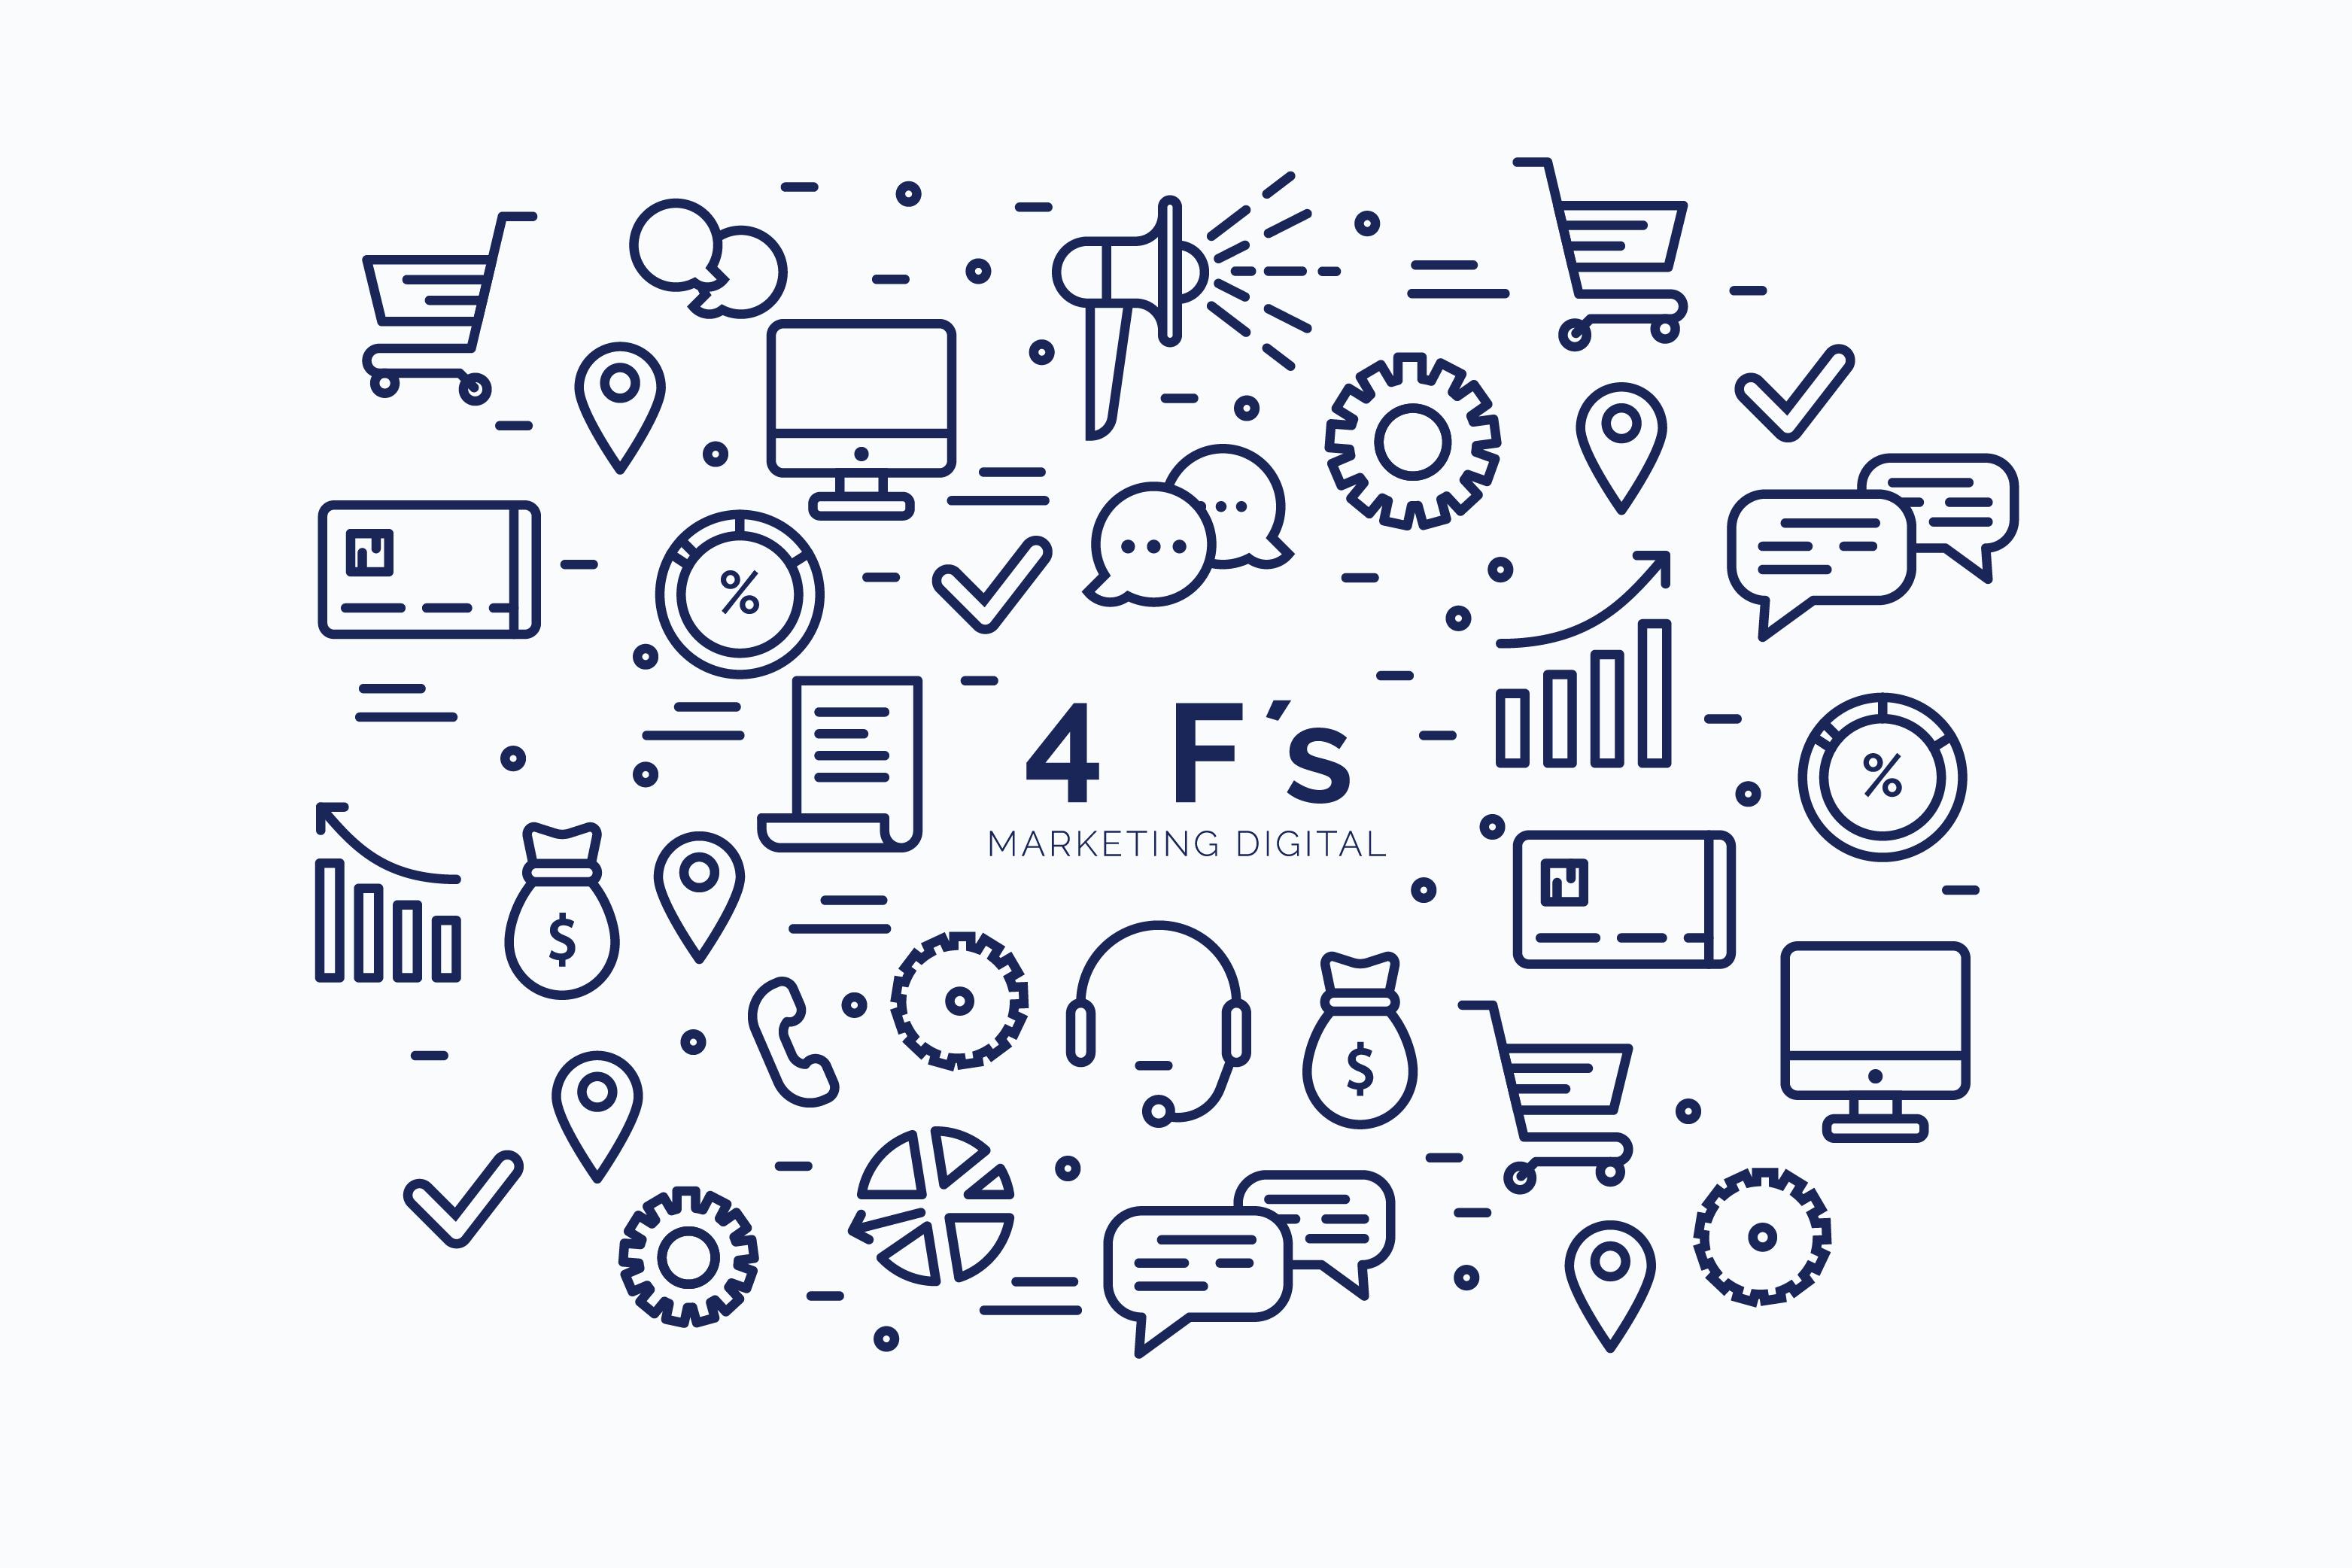 Las 4 F's del marketing digital